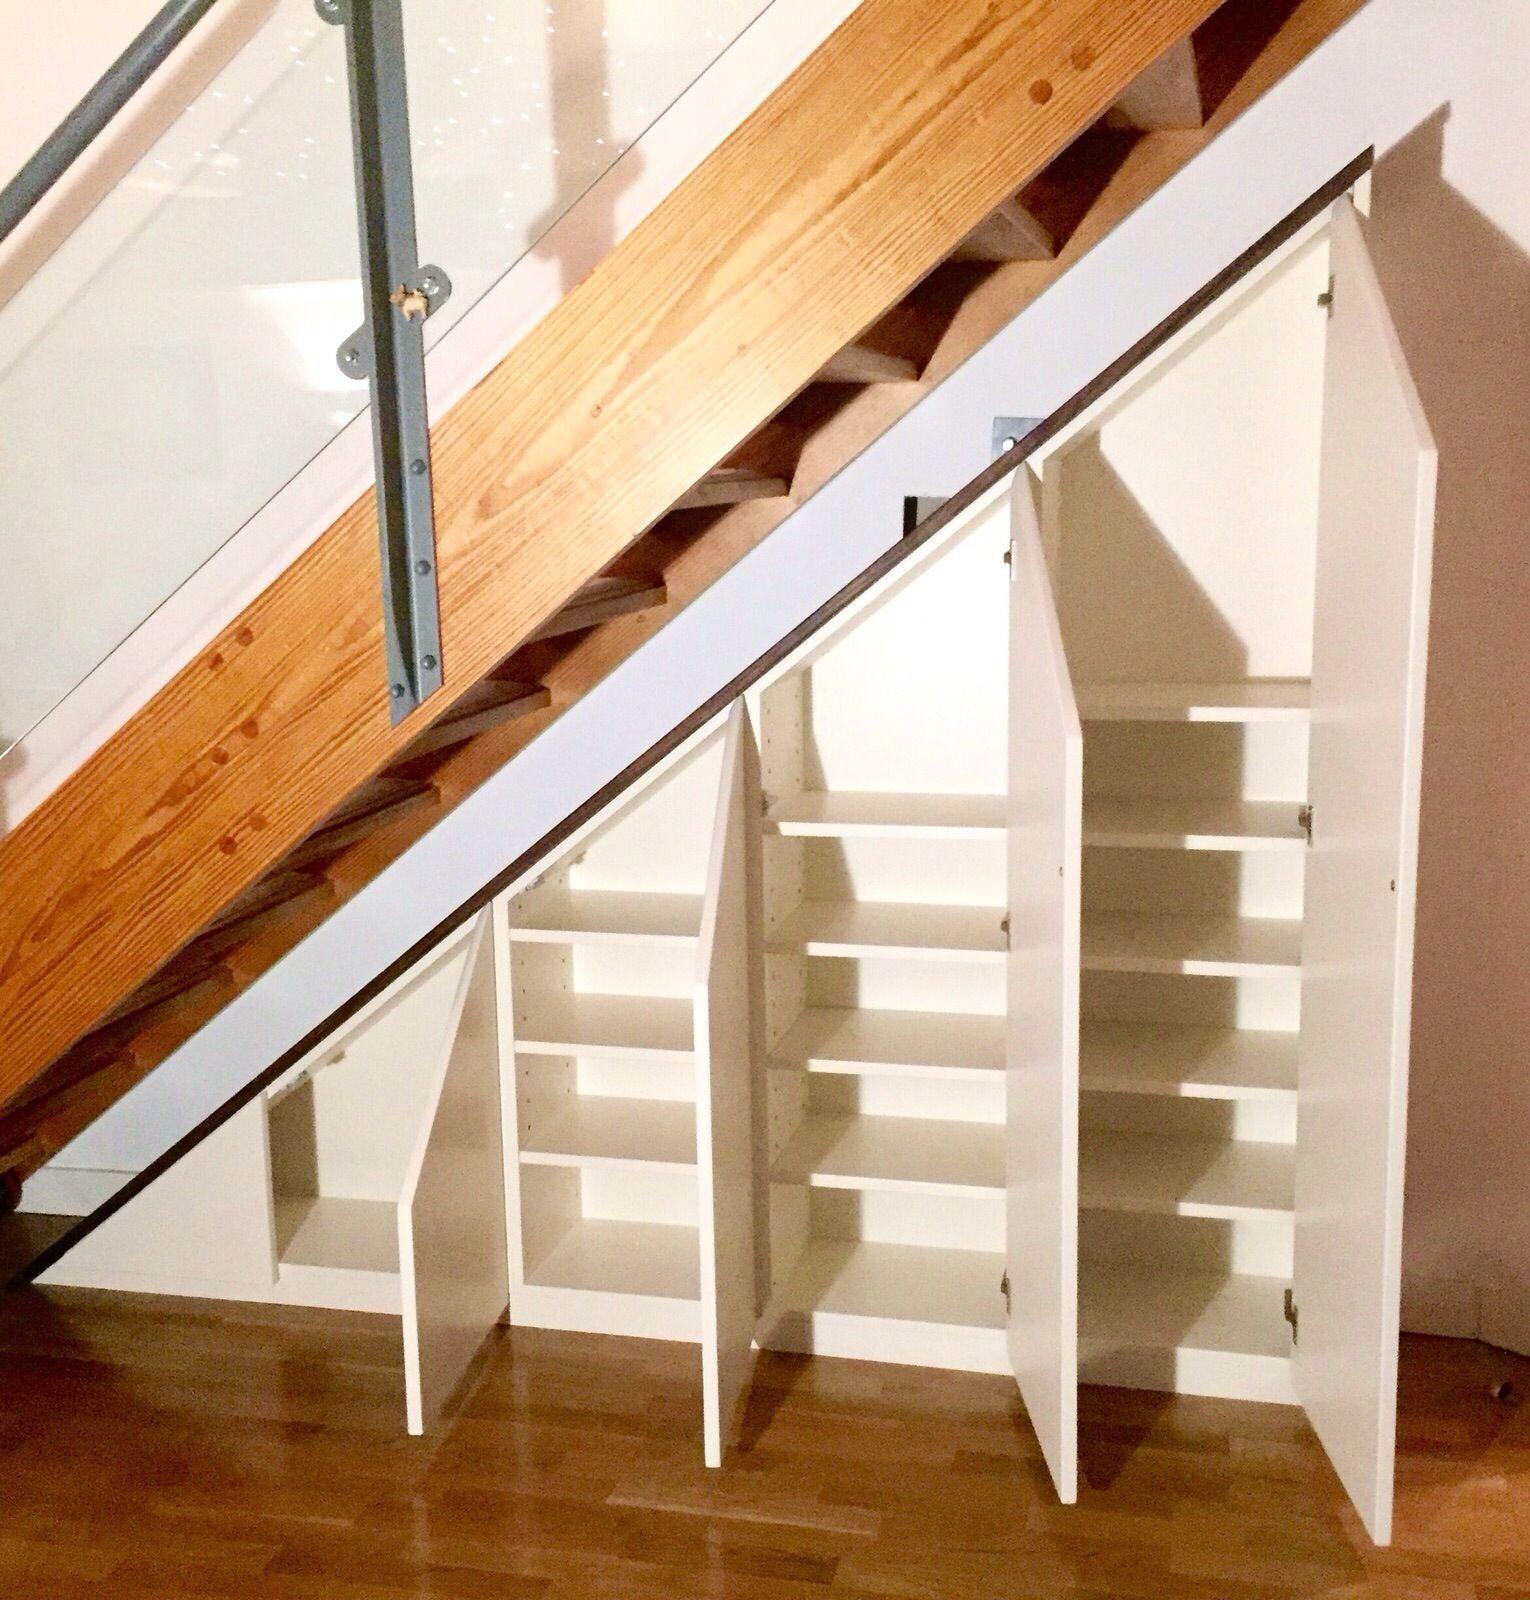 Bespoke Under Stairs Shelving: Under Stair Cabinet, Utilising Space/ Storage Ideas By